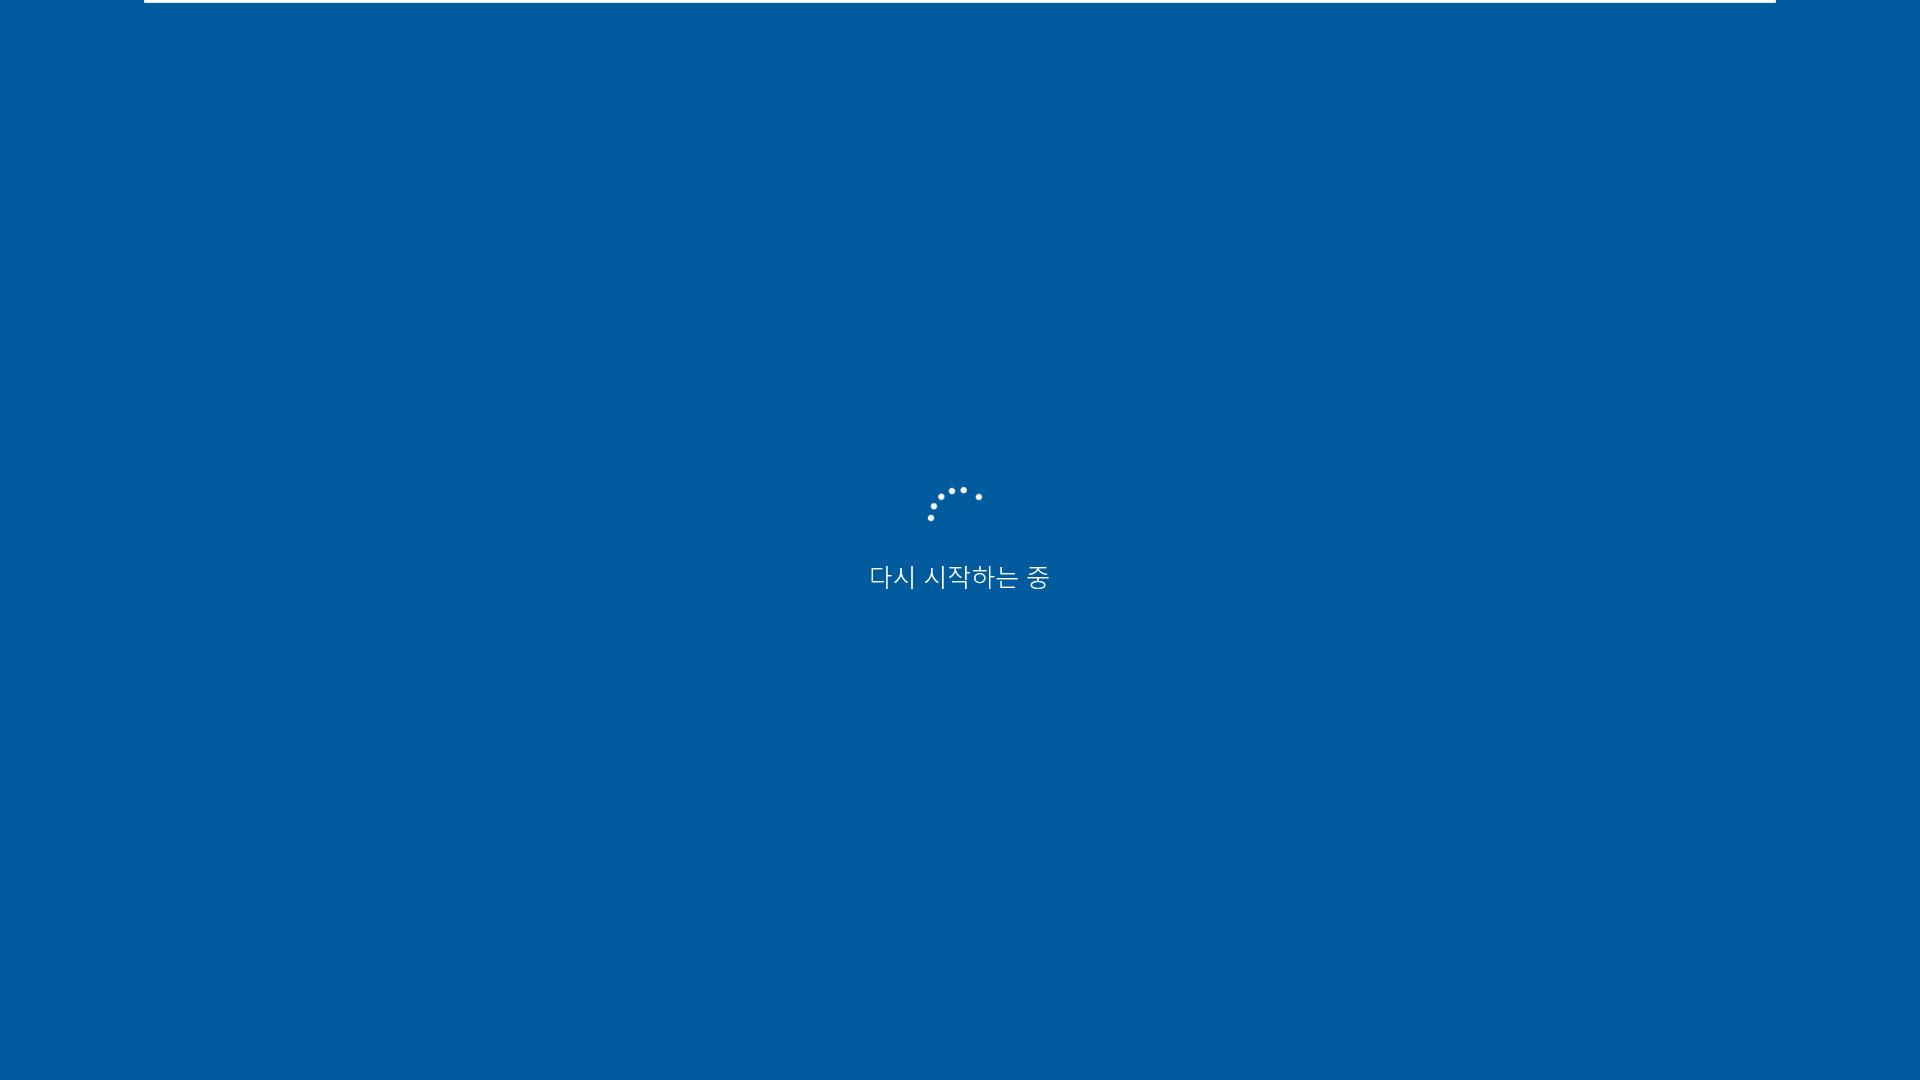 Windows 10 업데이트 방지하기 [업데이트 다운로드 폴더 사용 금지].bat 테스트 - 버전 1803, Home 에서 버전 1903 기능 업데이트 방지하기 2019-11-07_084346.jpg